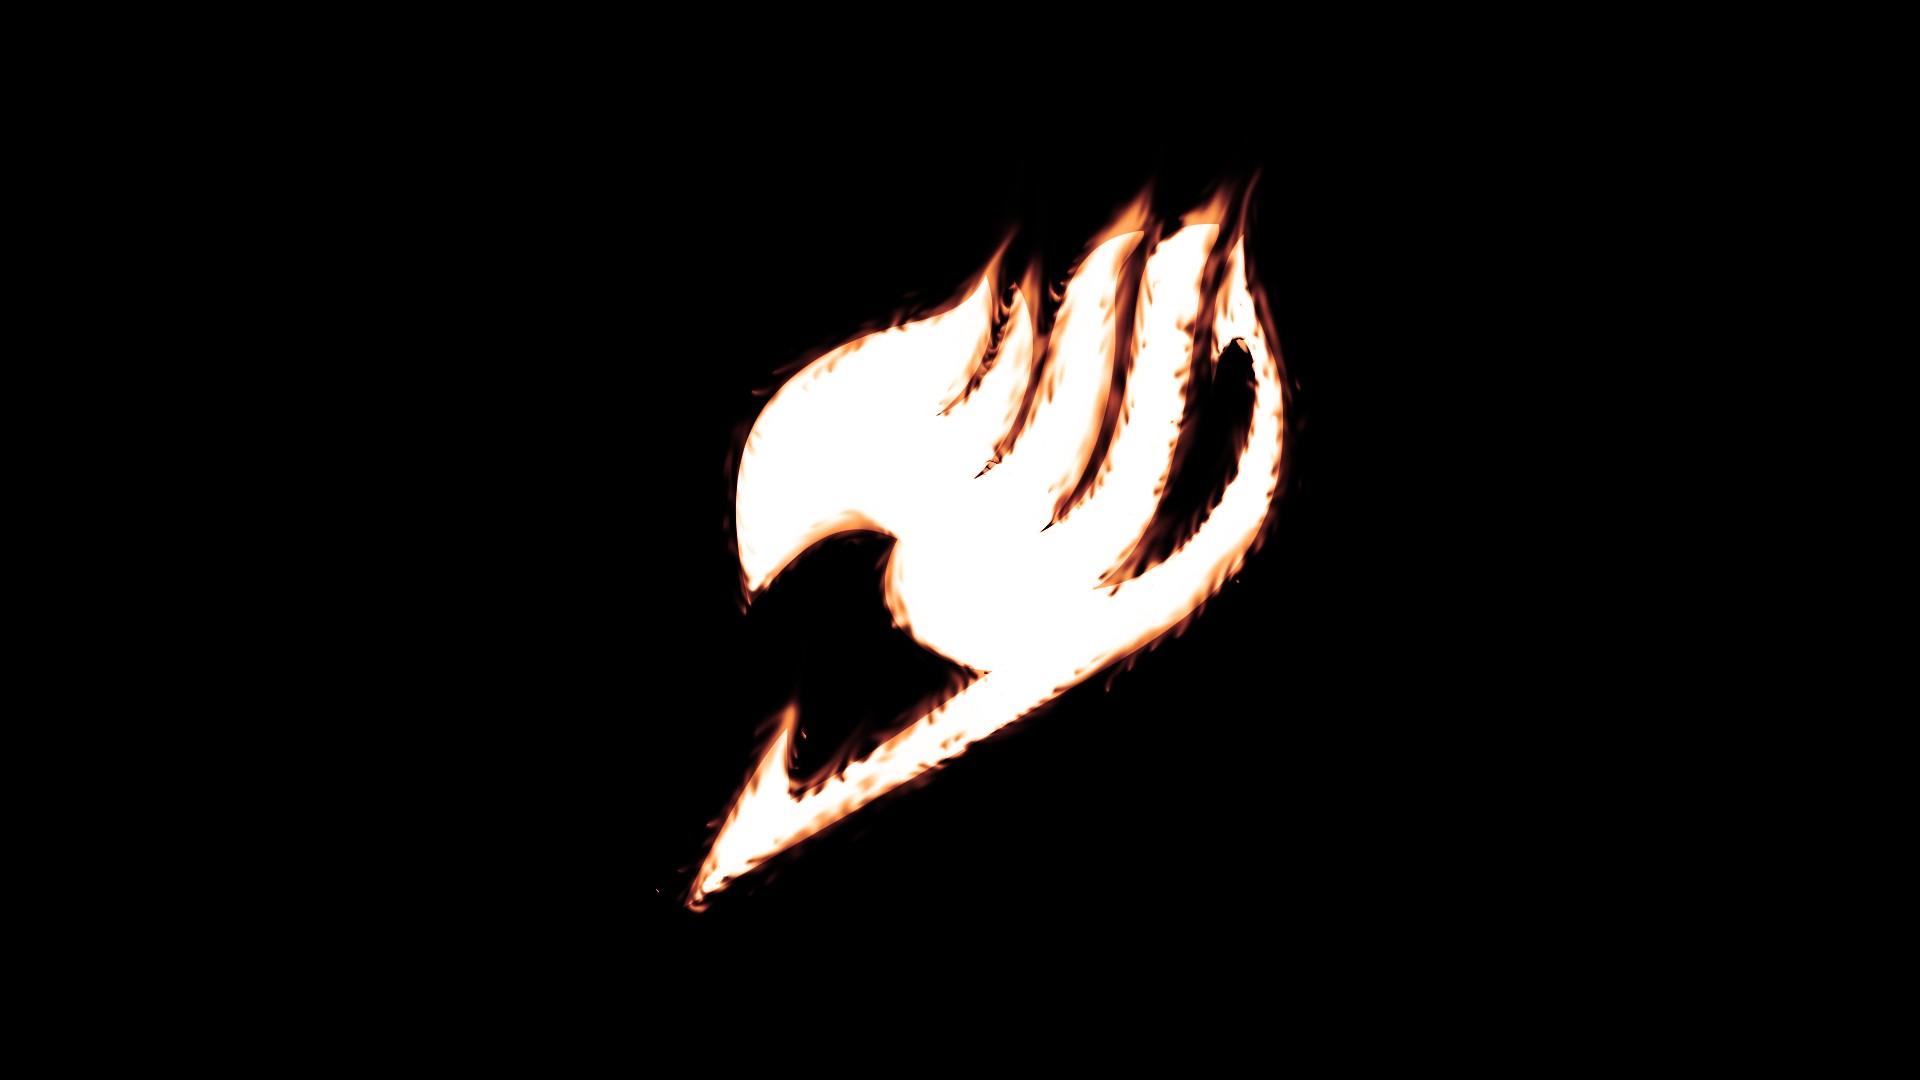 Fairy Tail Logo Wallpaper 1920x1080